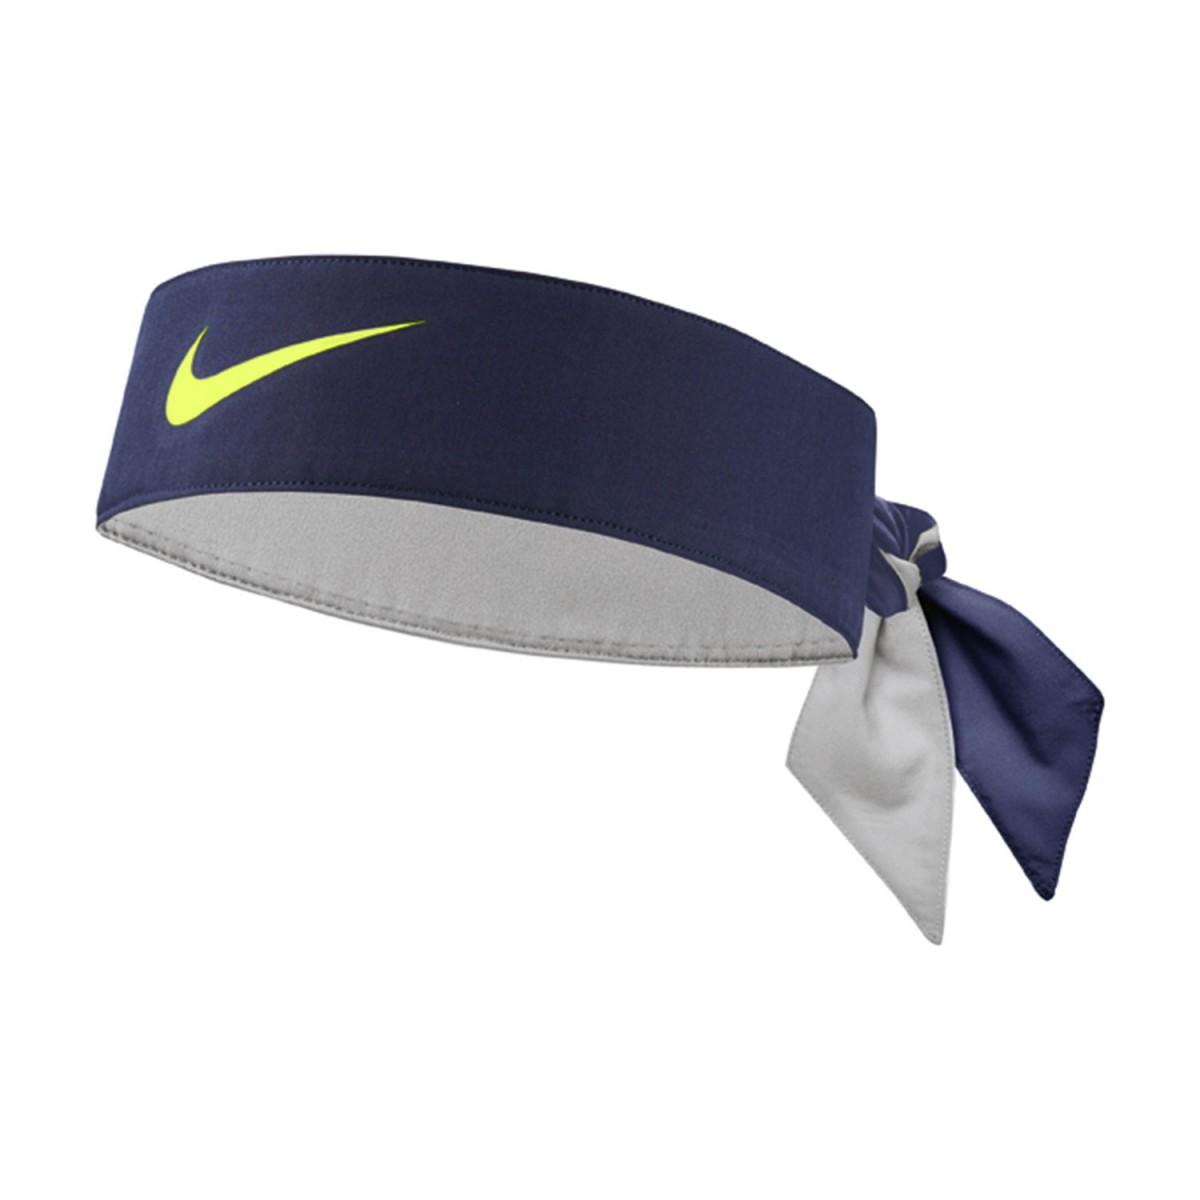 Бандана Nike Dry Tennis Headband blackened blue/ghost green